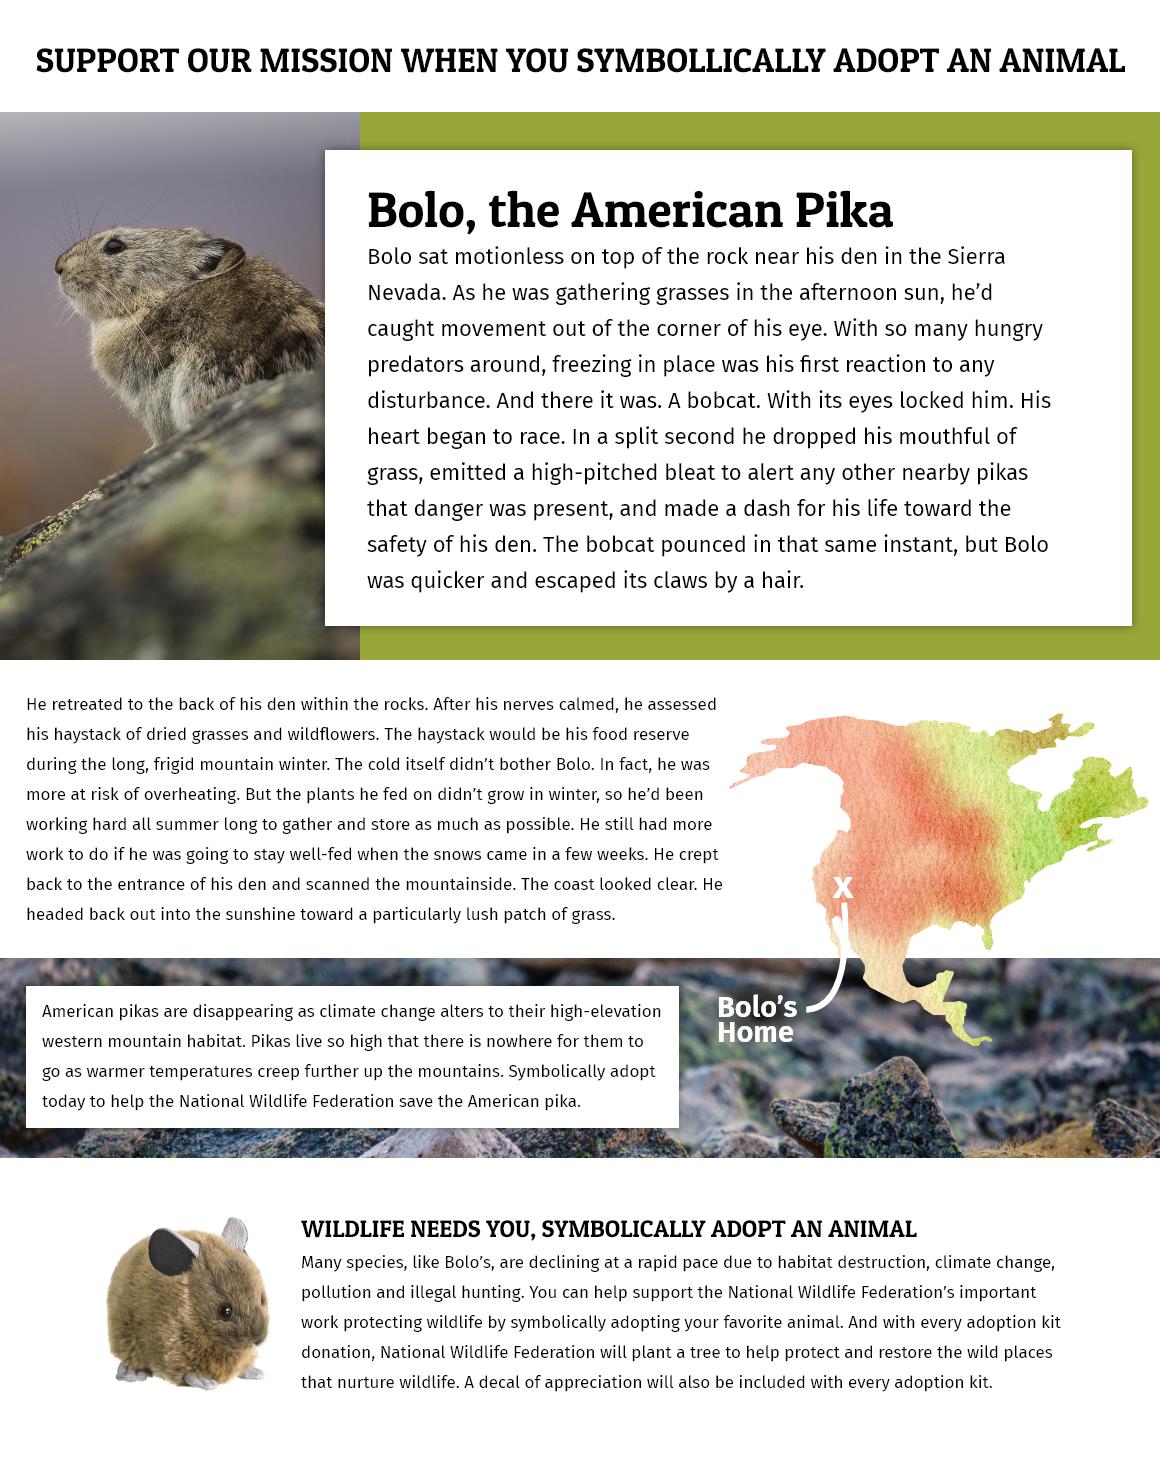 Adopt an American Pika header image